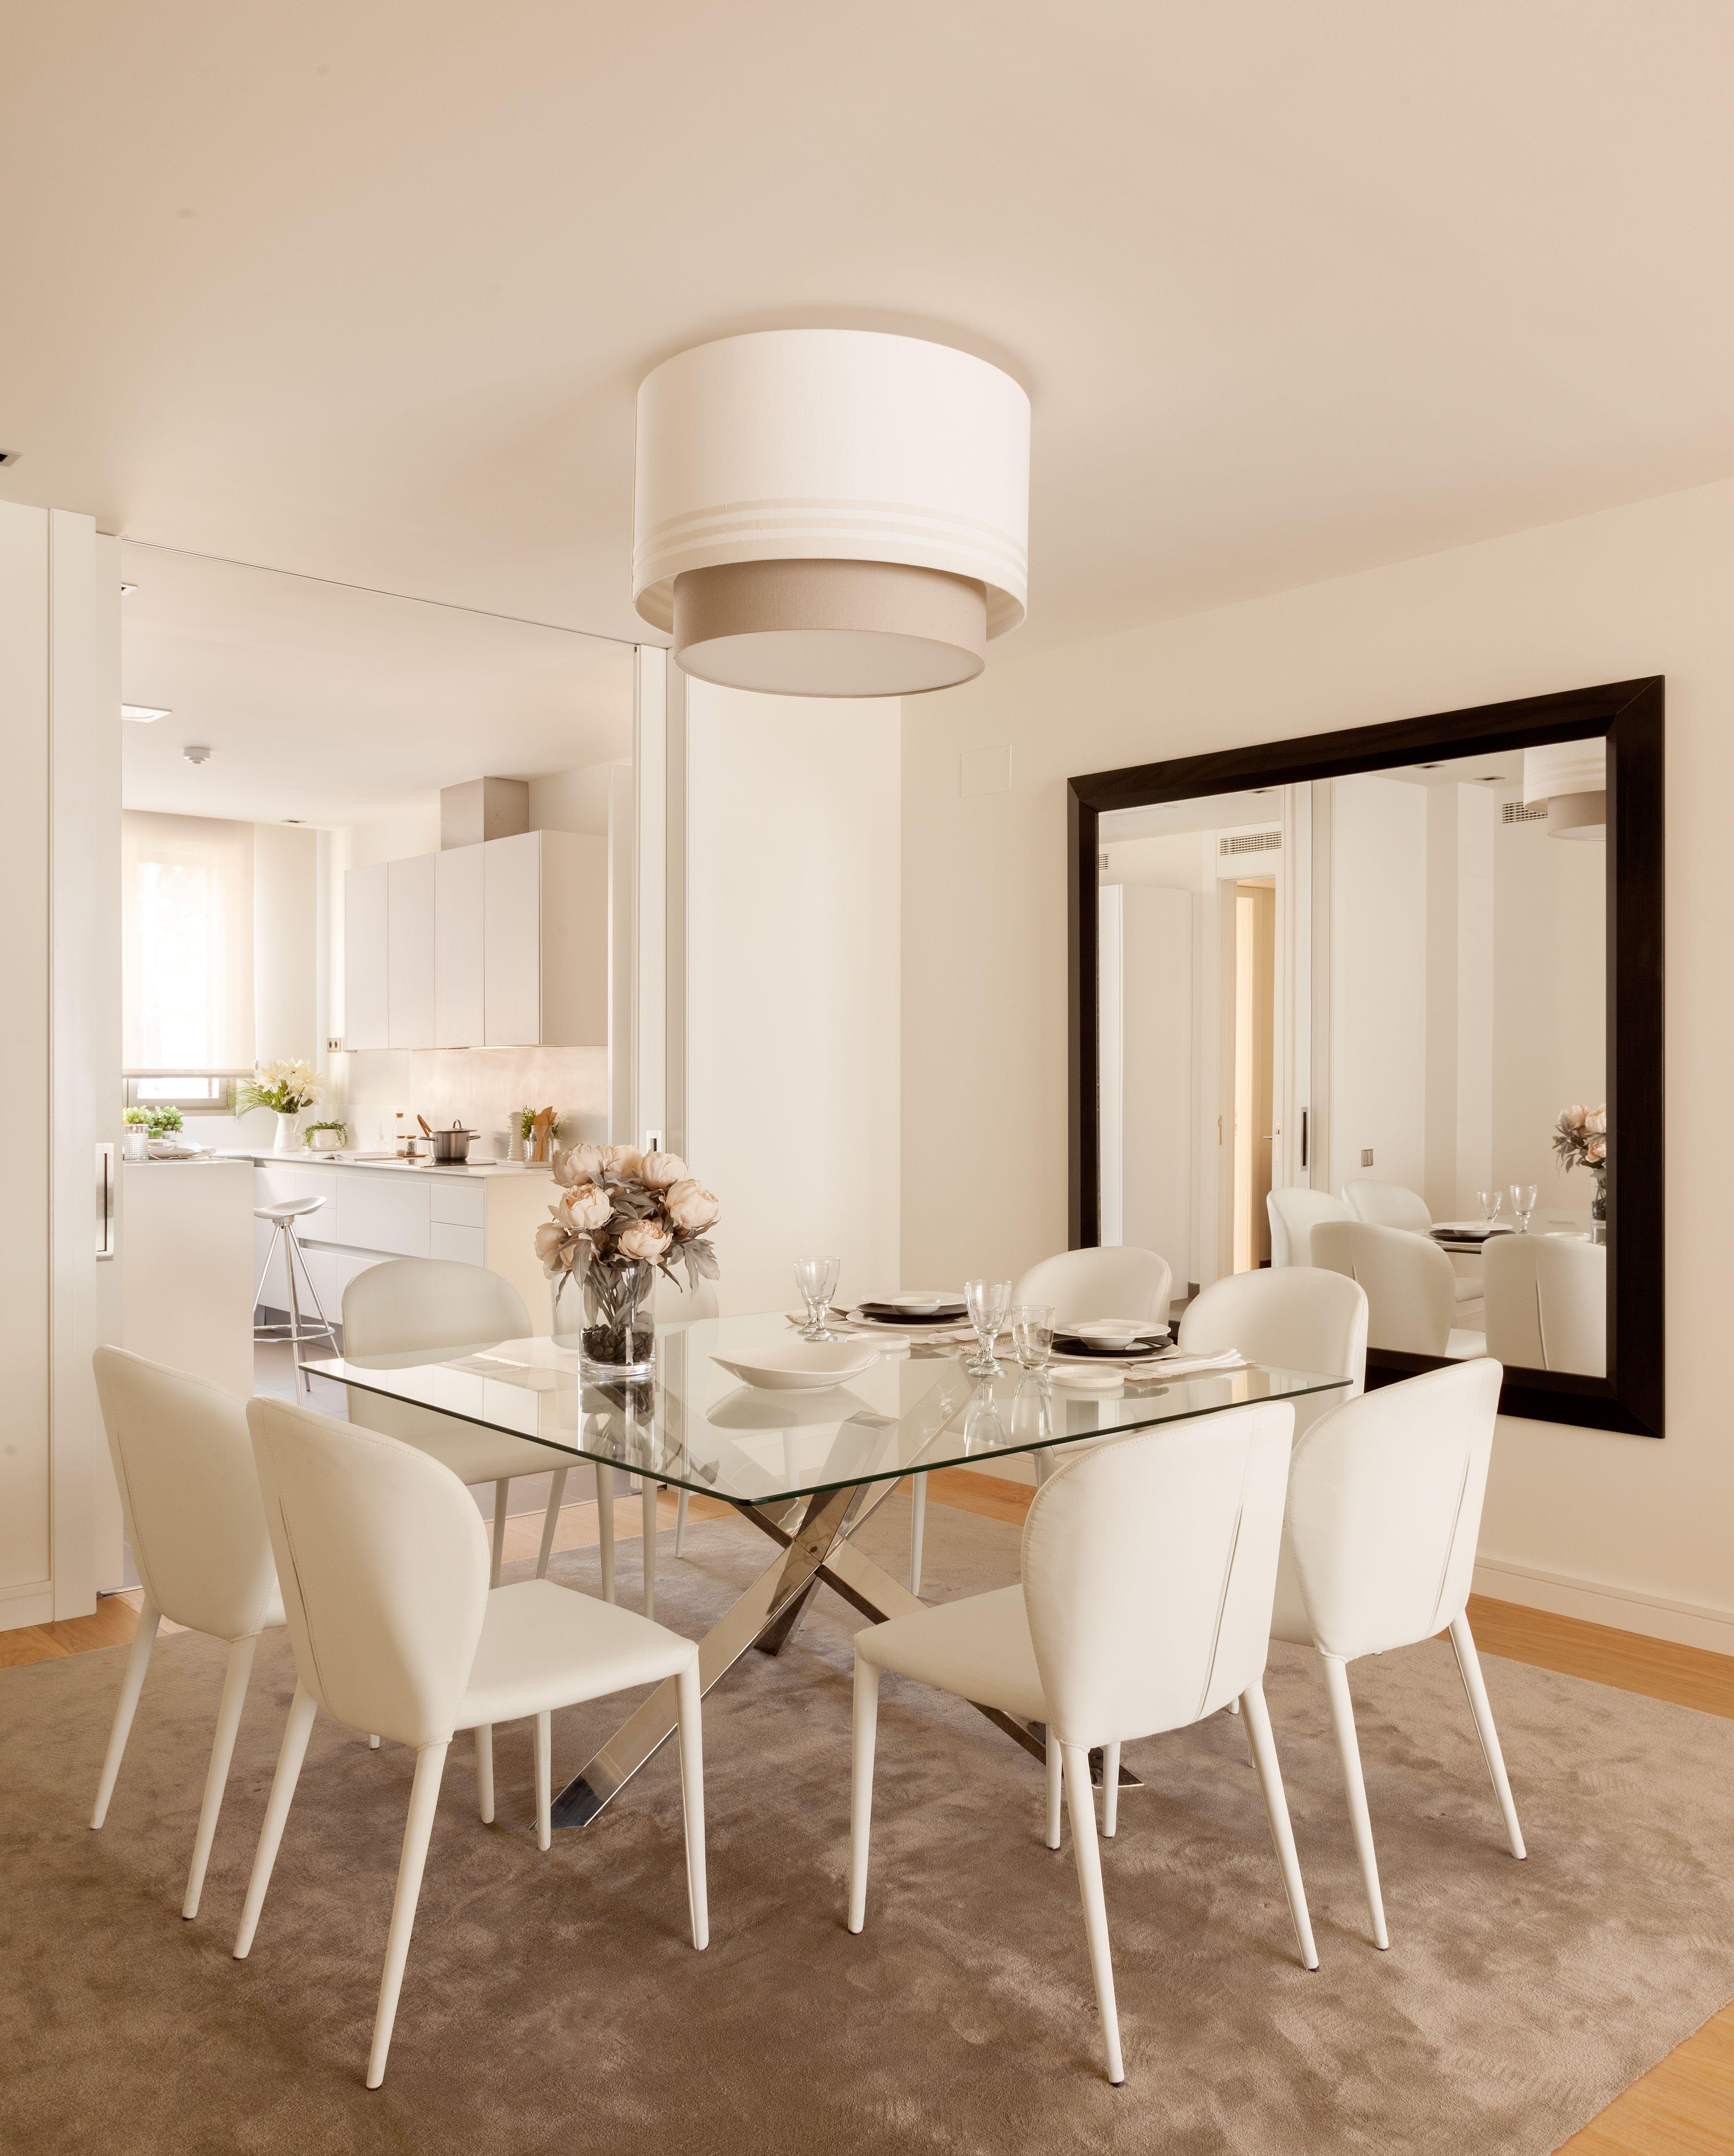 Sala da pranzo contemporaneo moderno bianco sala da for Mobili sala da pranzo moderni